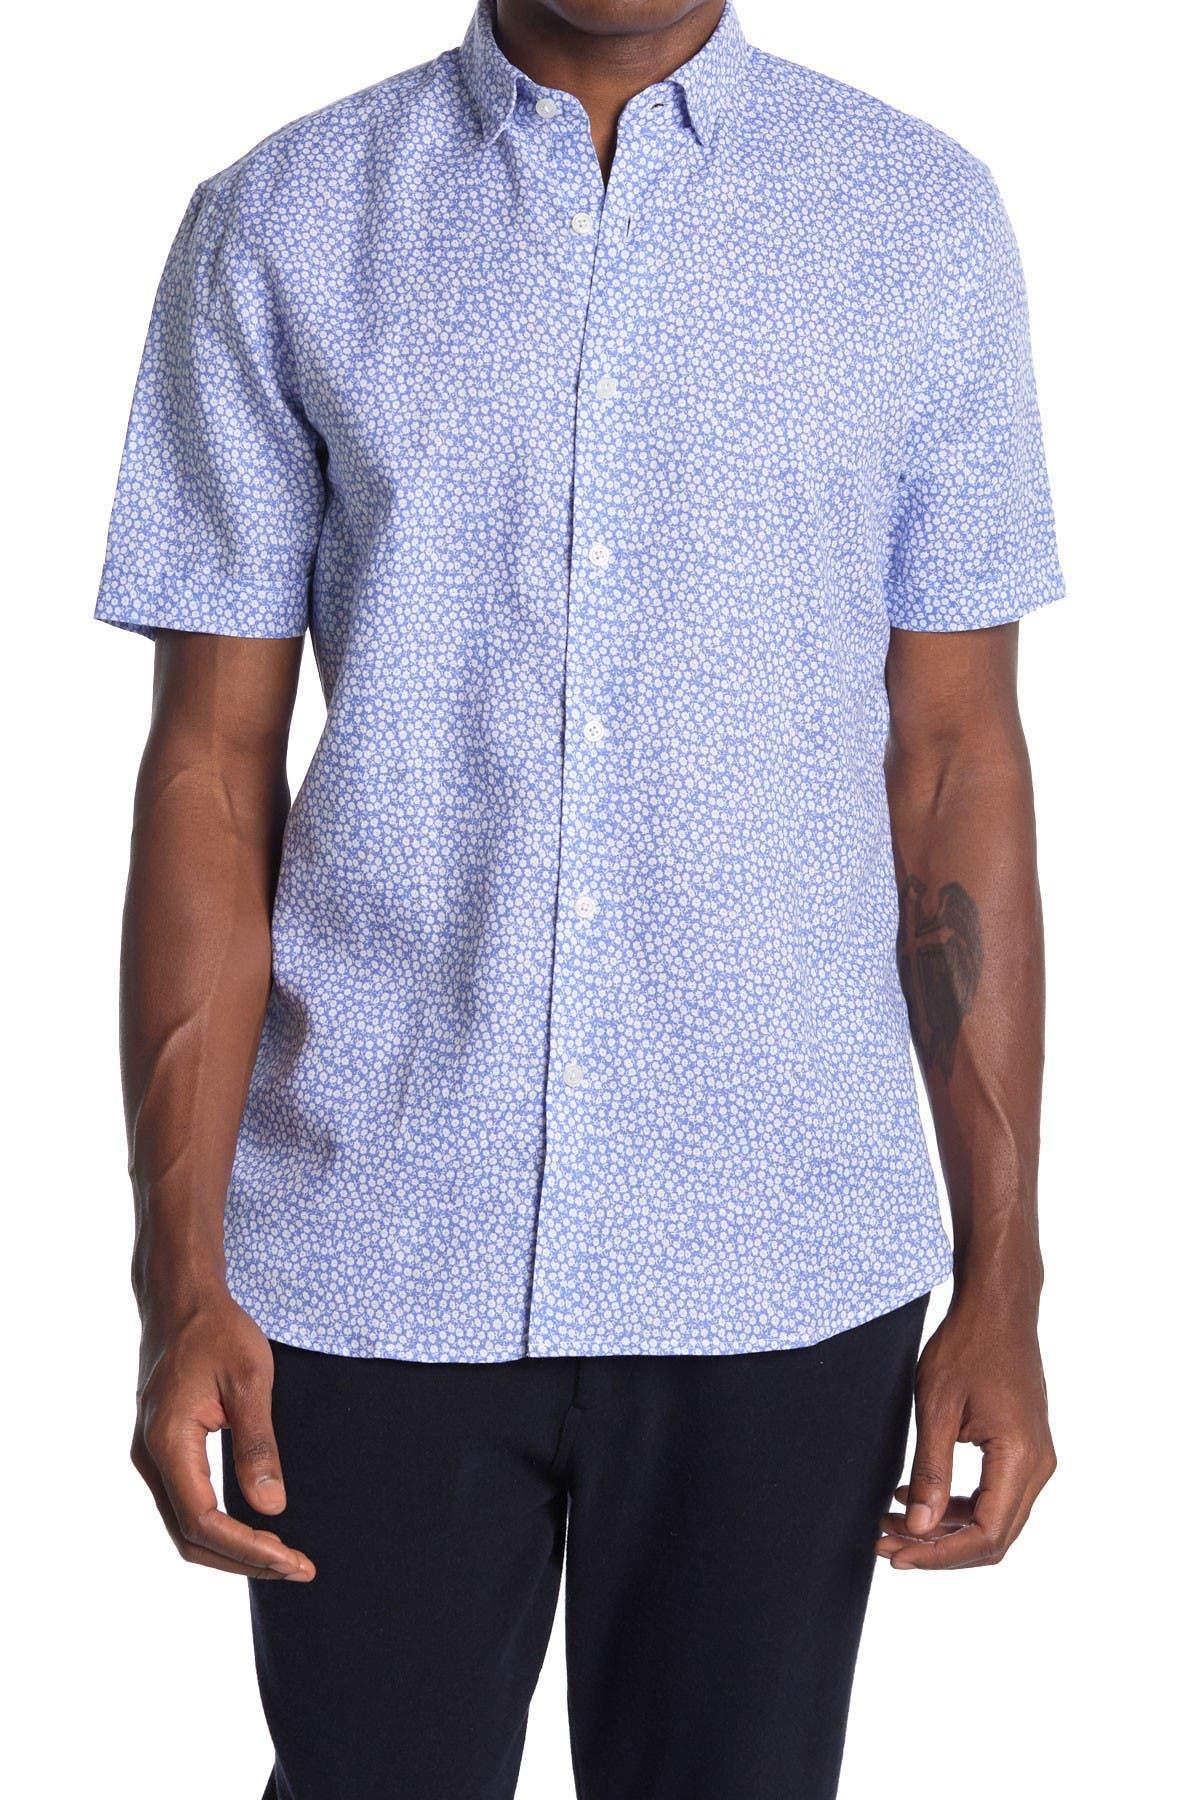 Image of Toscano Short Sleeve Linen Blend Shirt